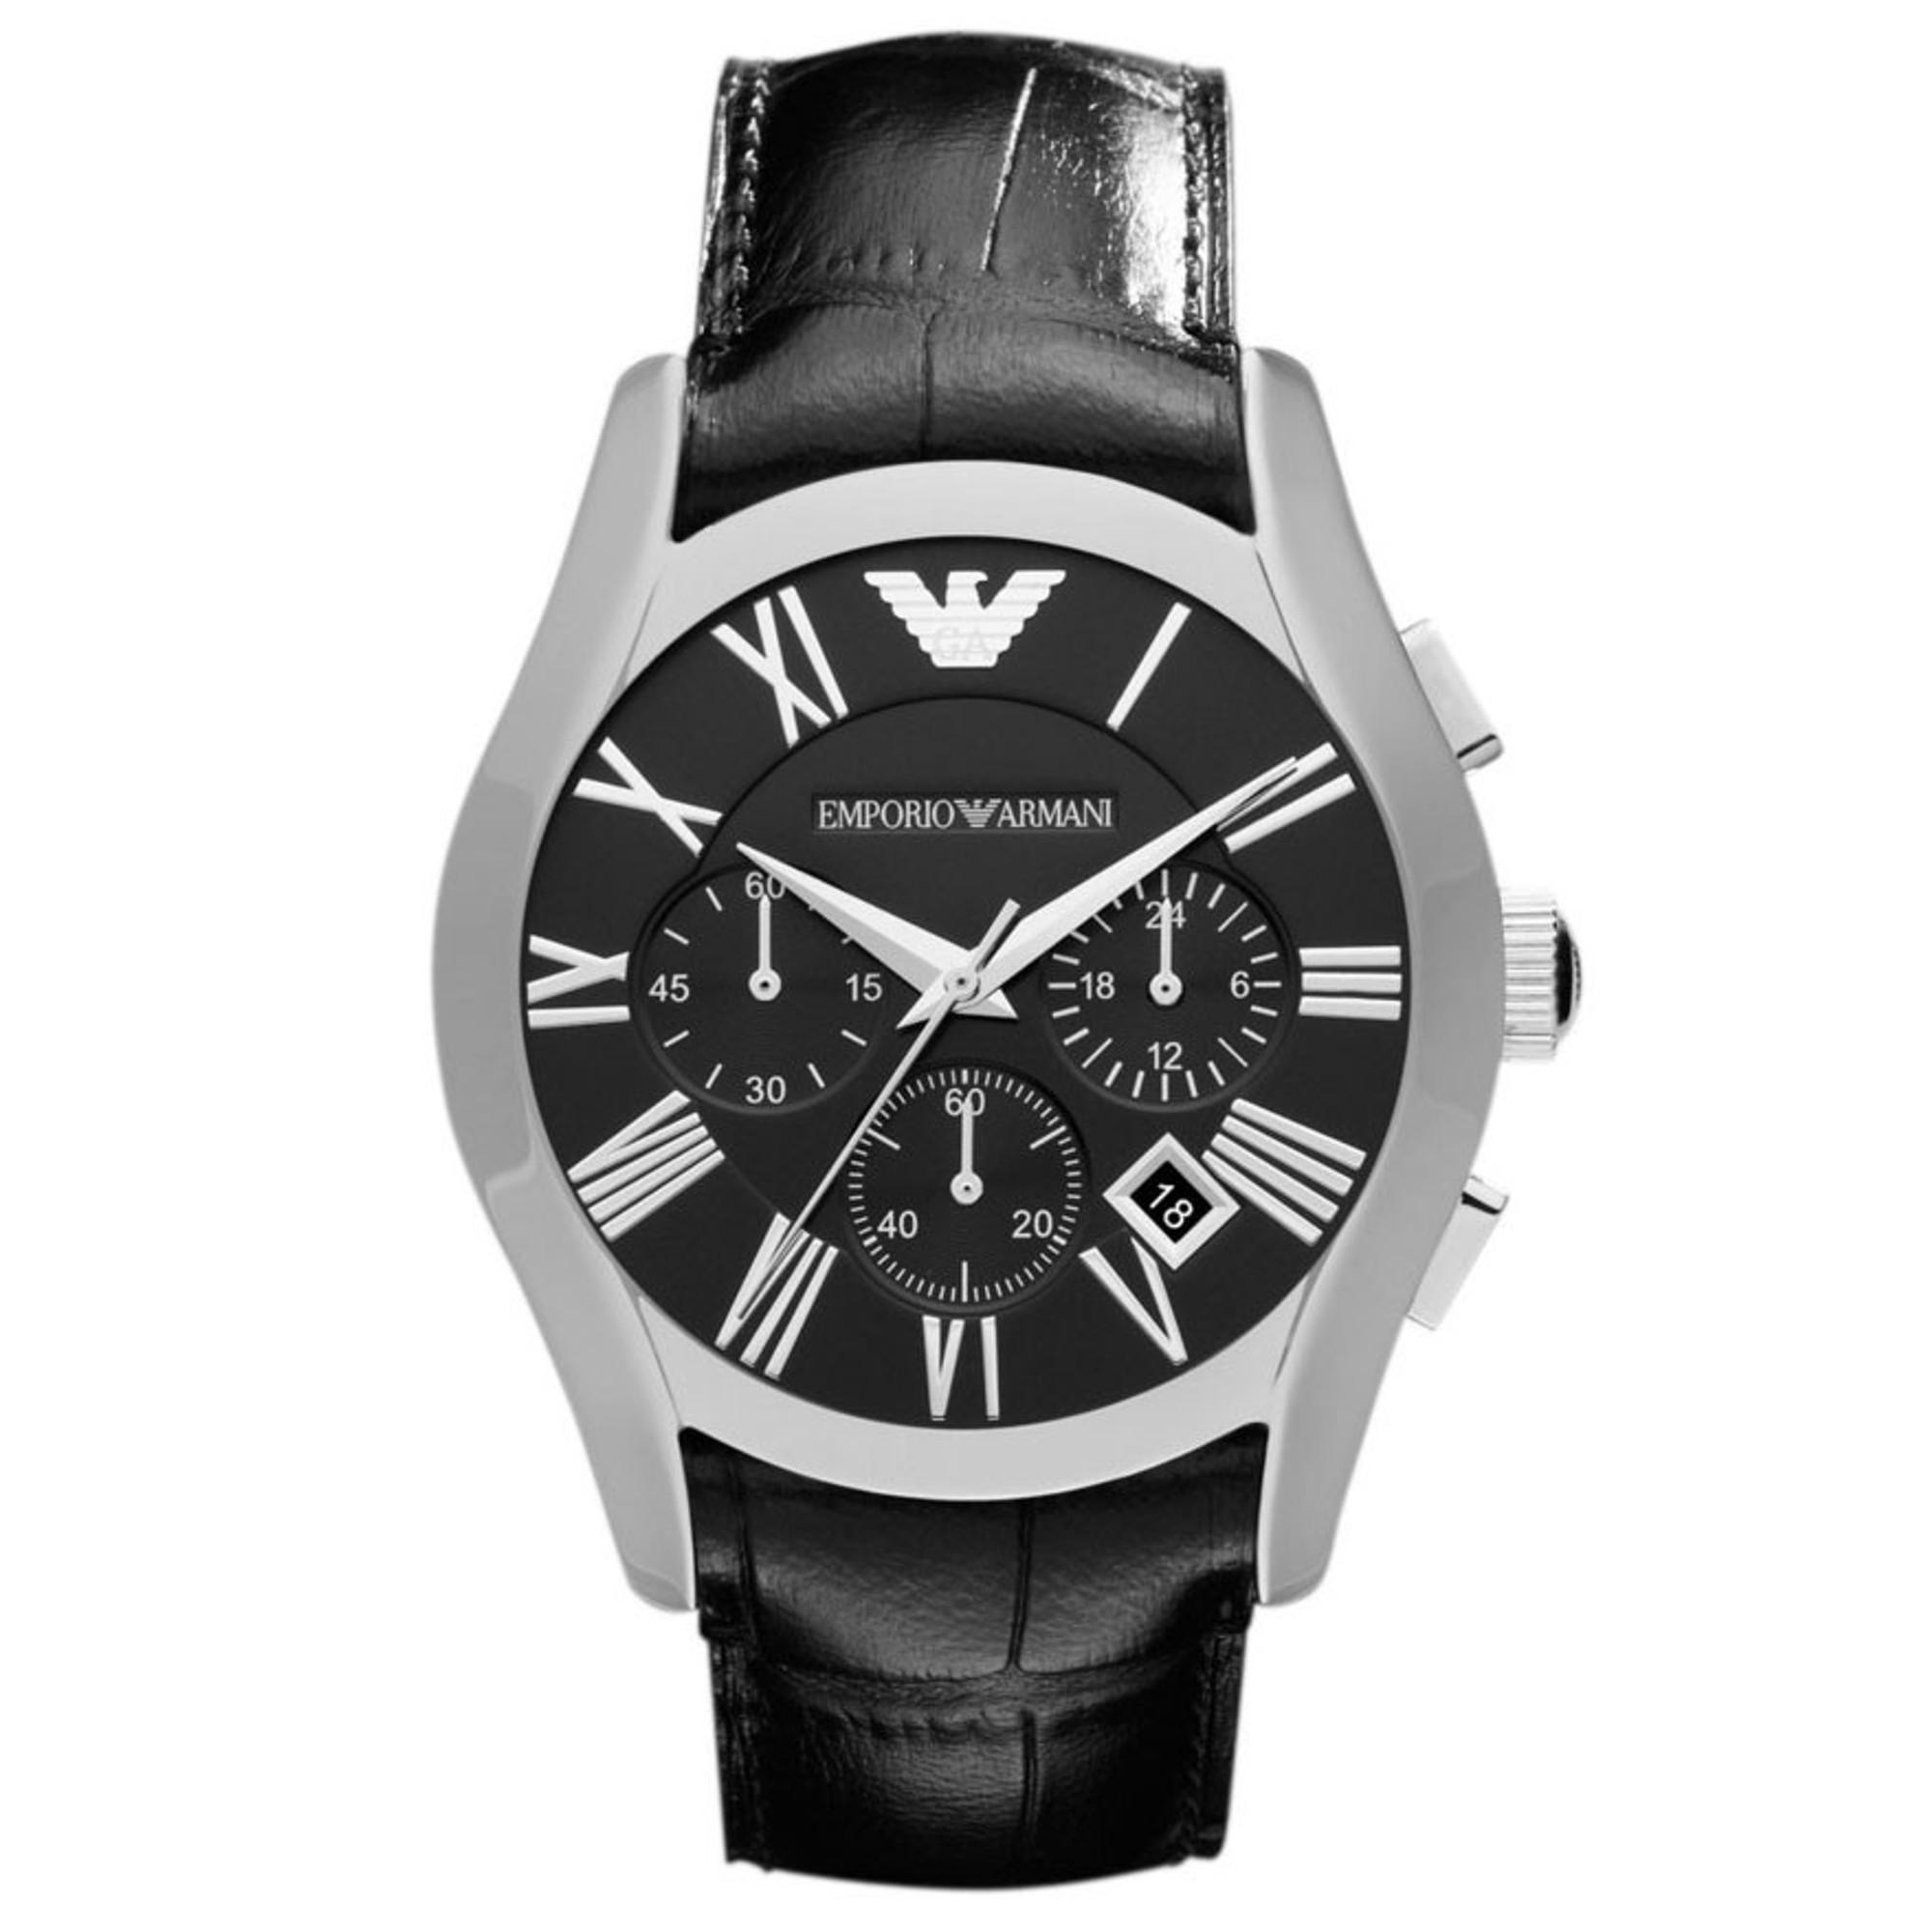 EMPORIO ARMANI Classic Watch Chronograph AR1633